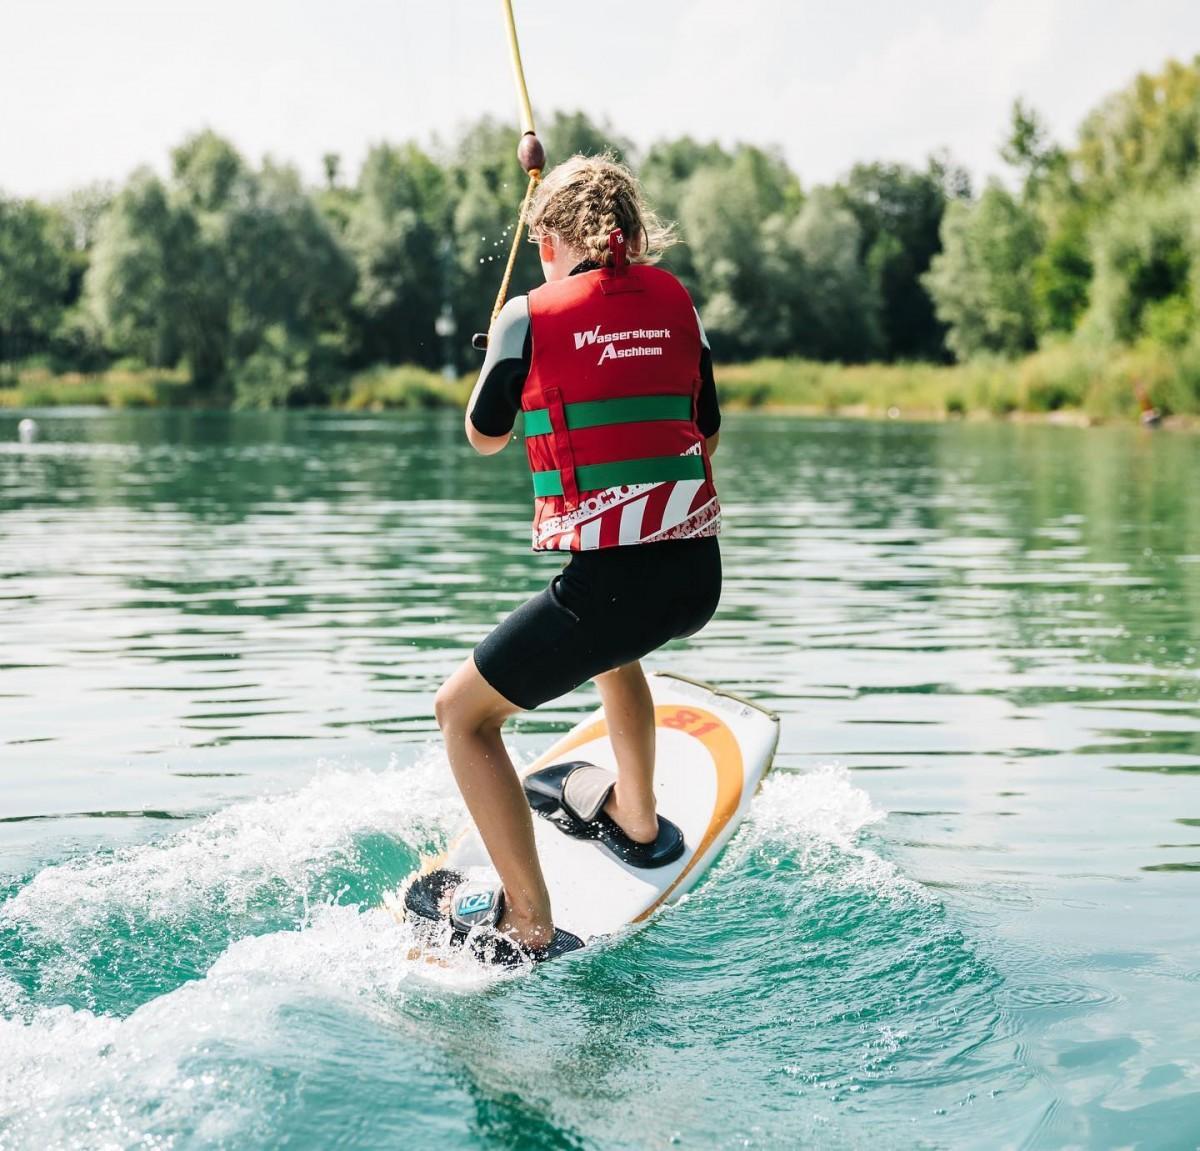 Aschheim Wasserskipark - Alt image